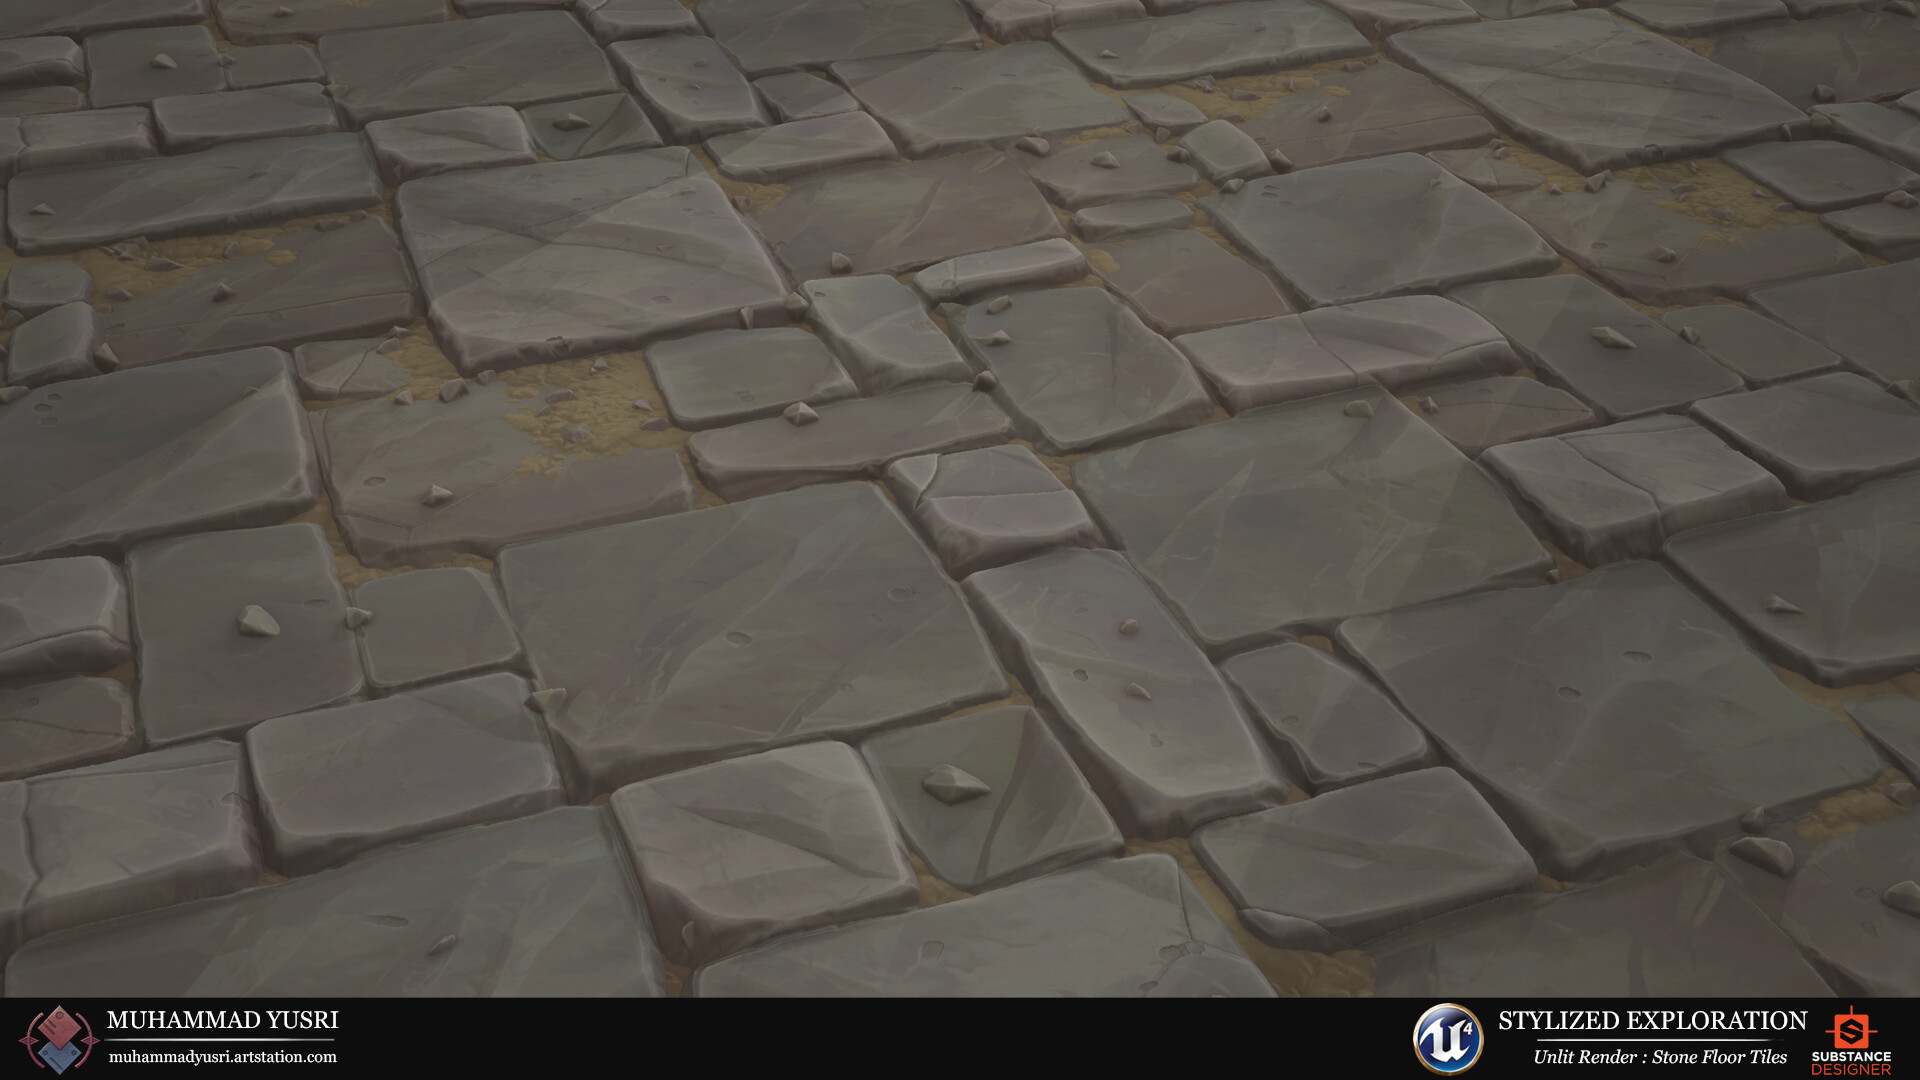 Muhammad Yusri Stylized Exploration Stone Floor Tiles